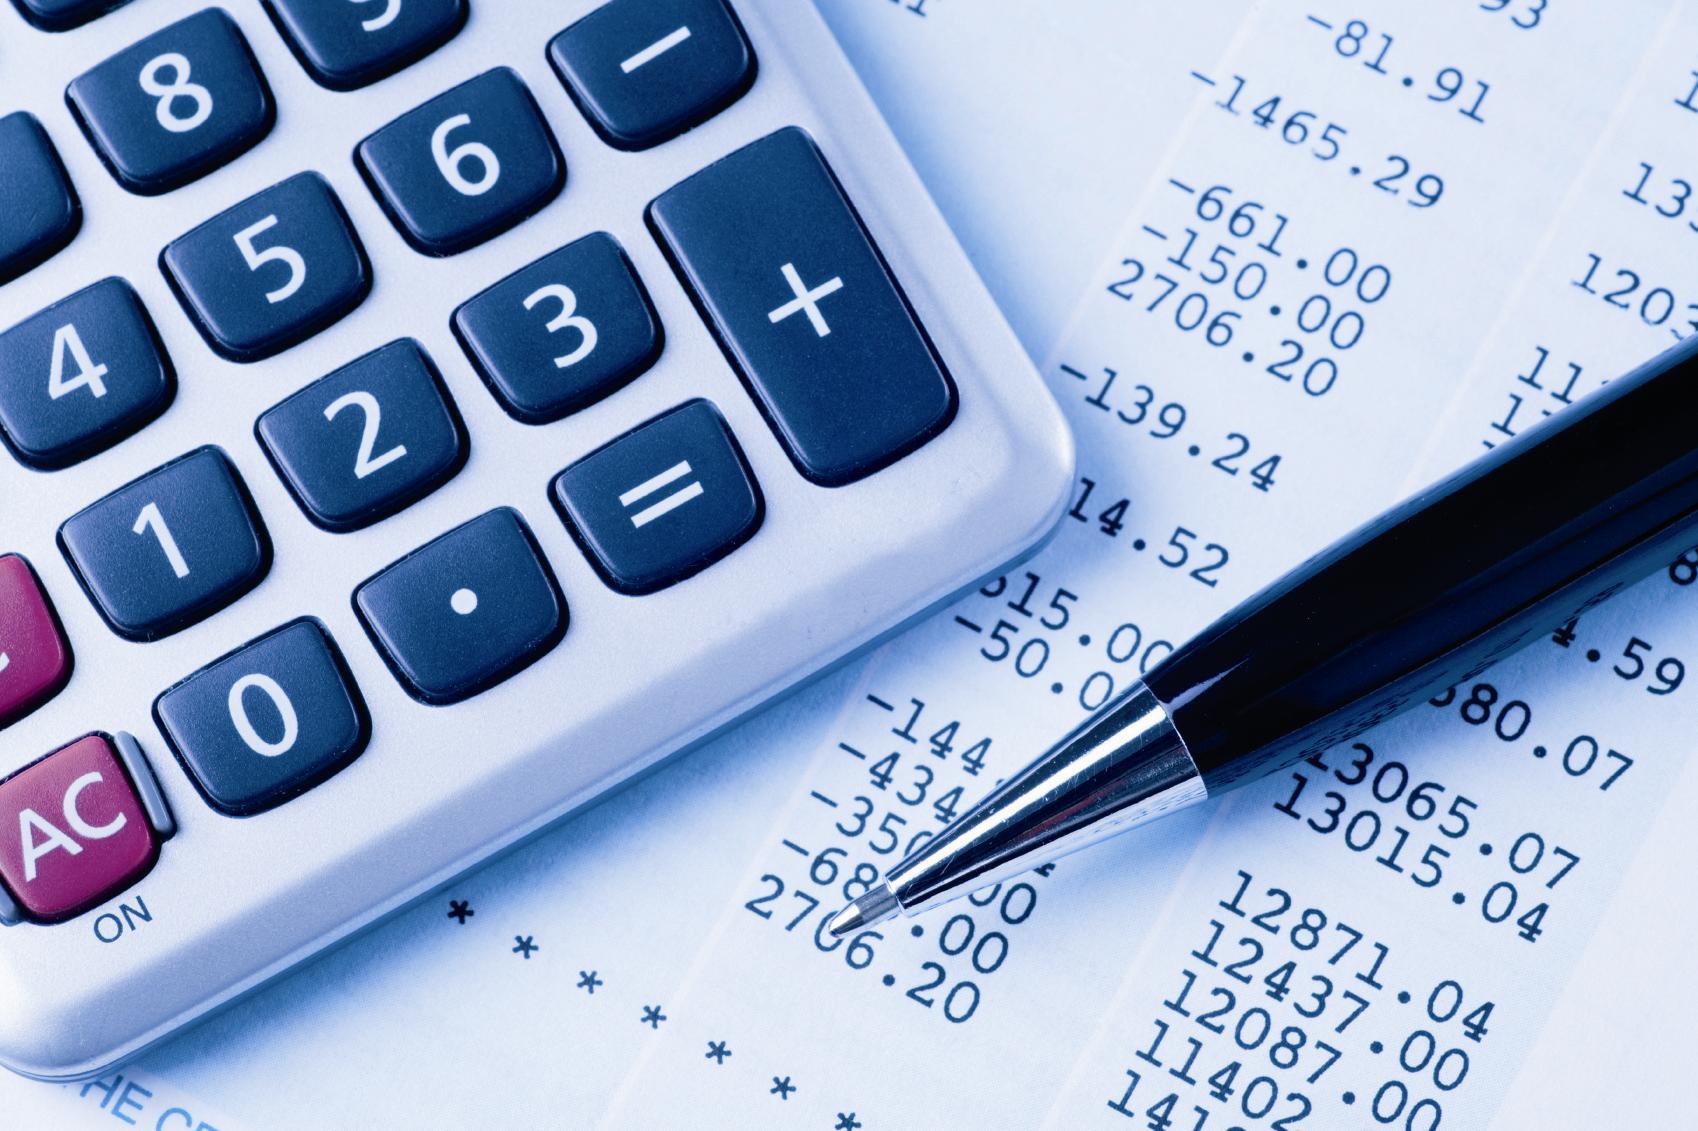 До 15 декември можем да променим авансовите вноски по ЗКПО за 2014 без лихви